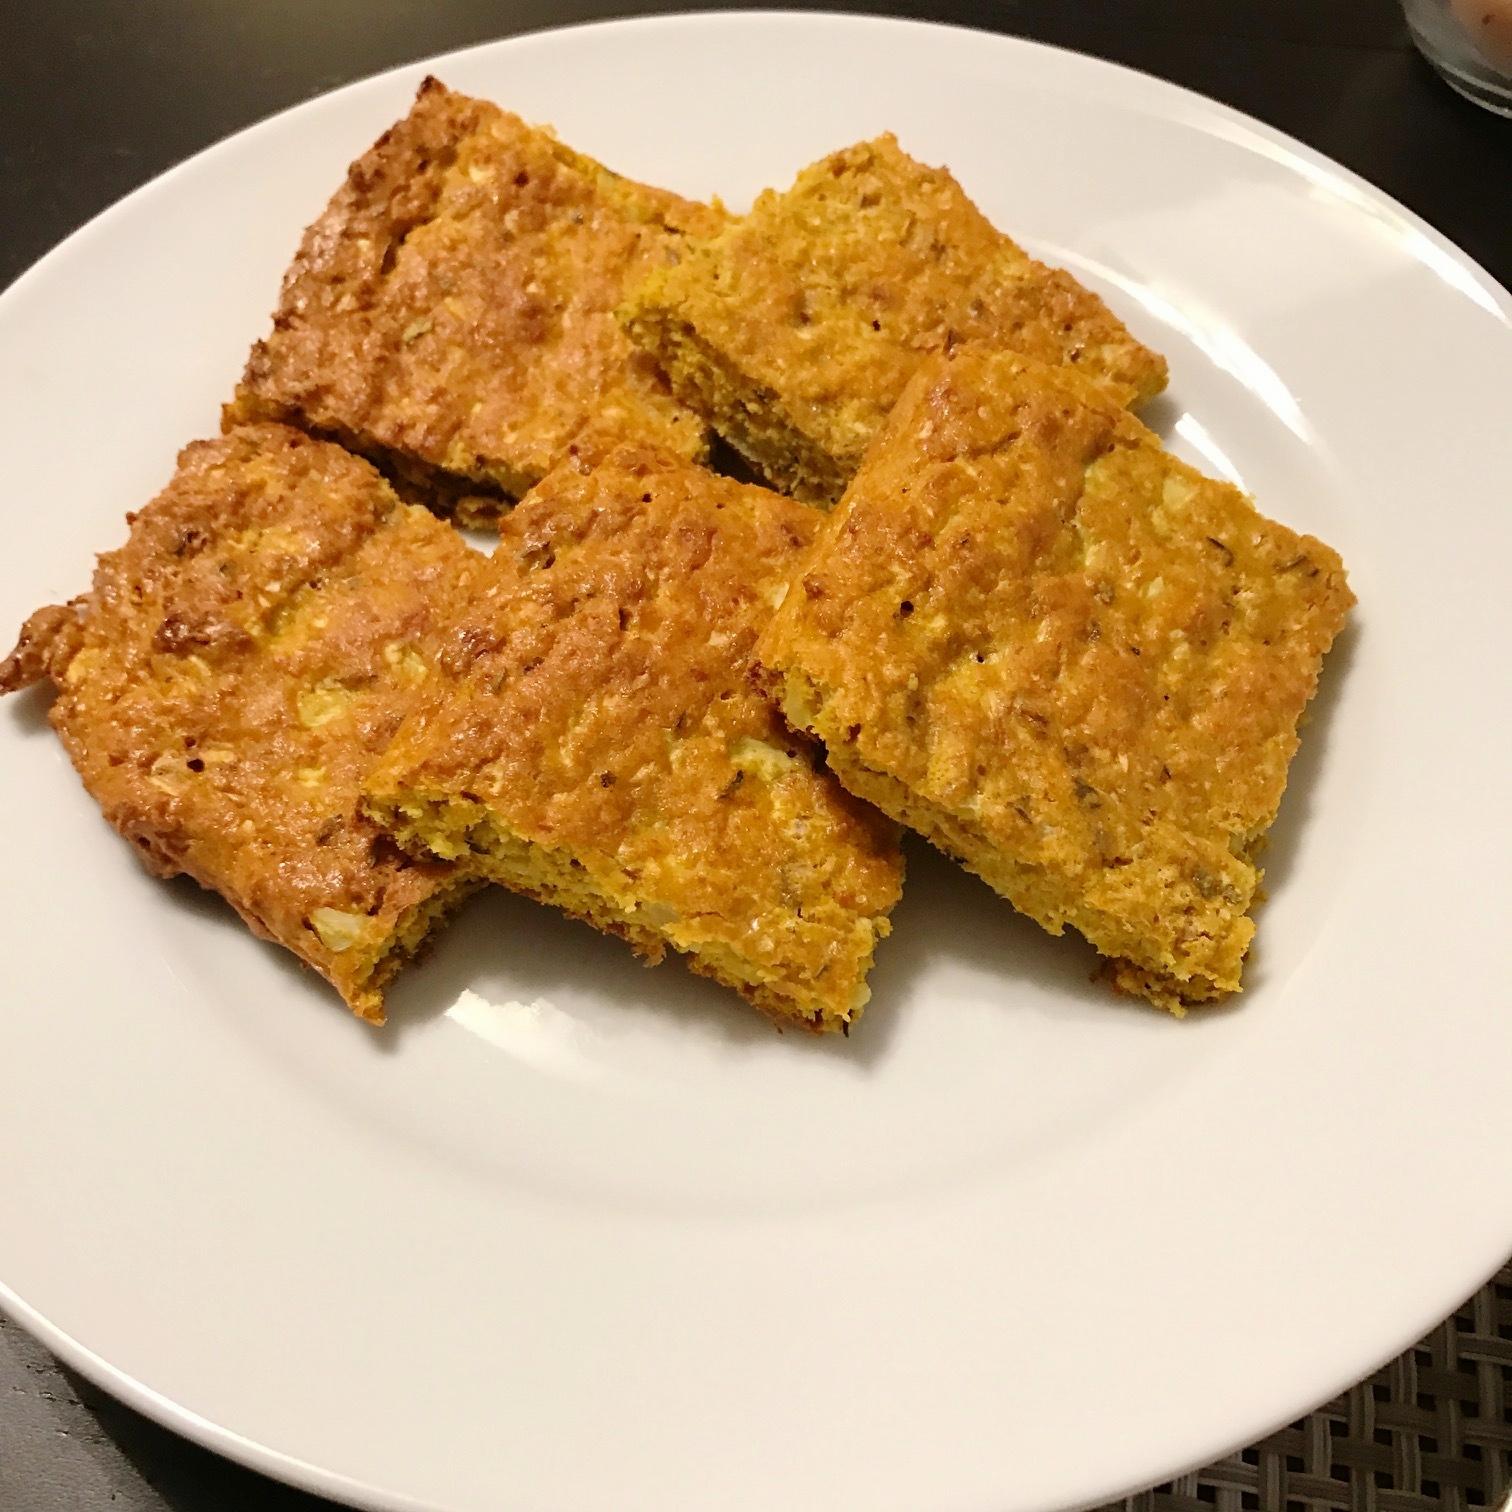 Paleo/Whole 30 Cauliflower Flatbread